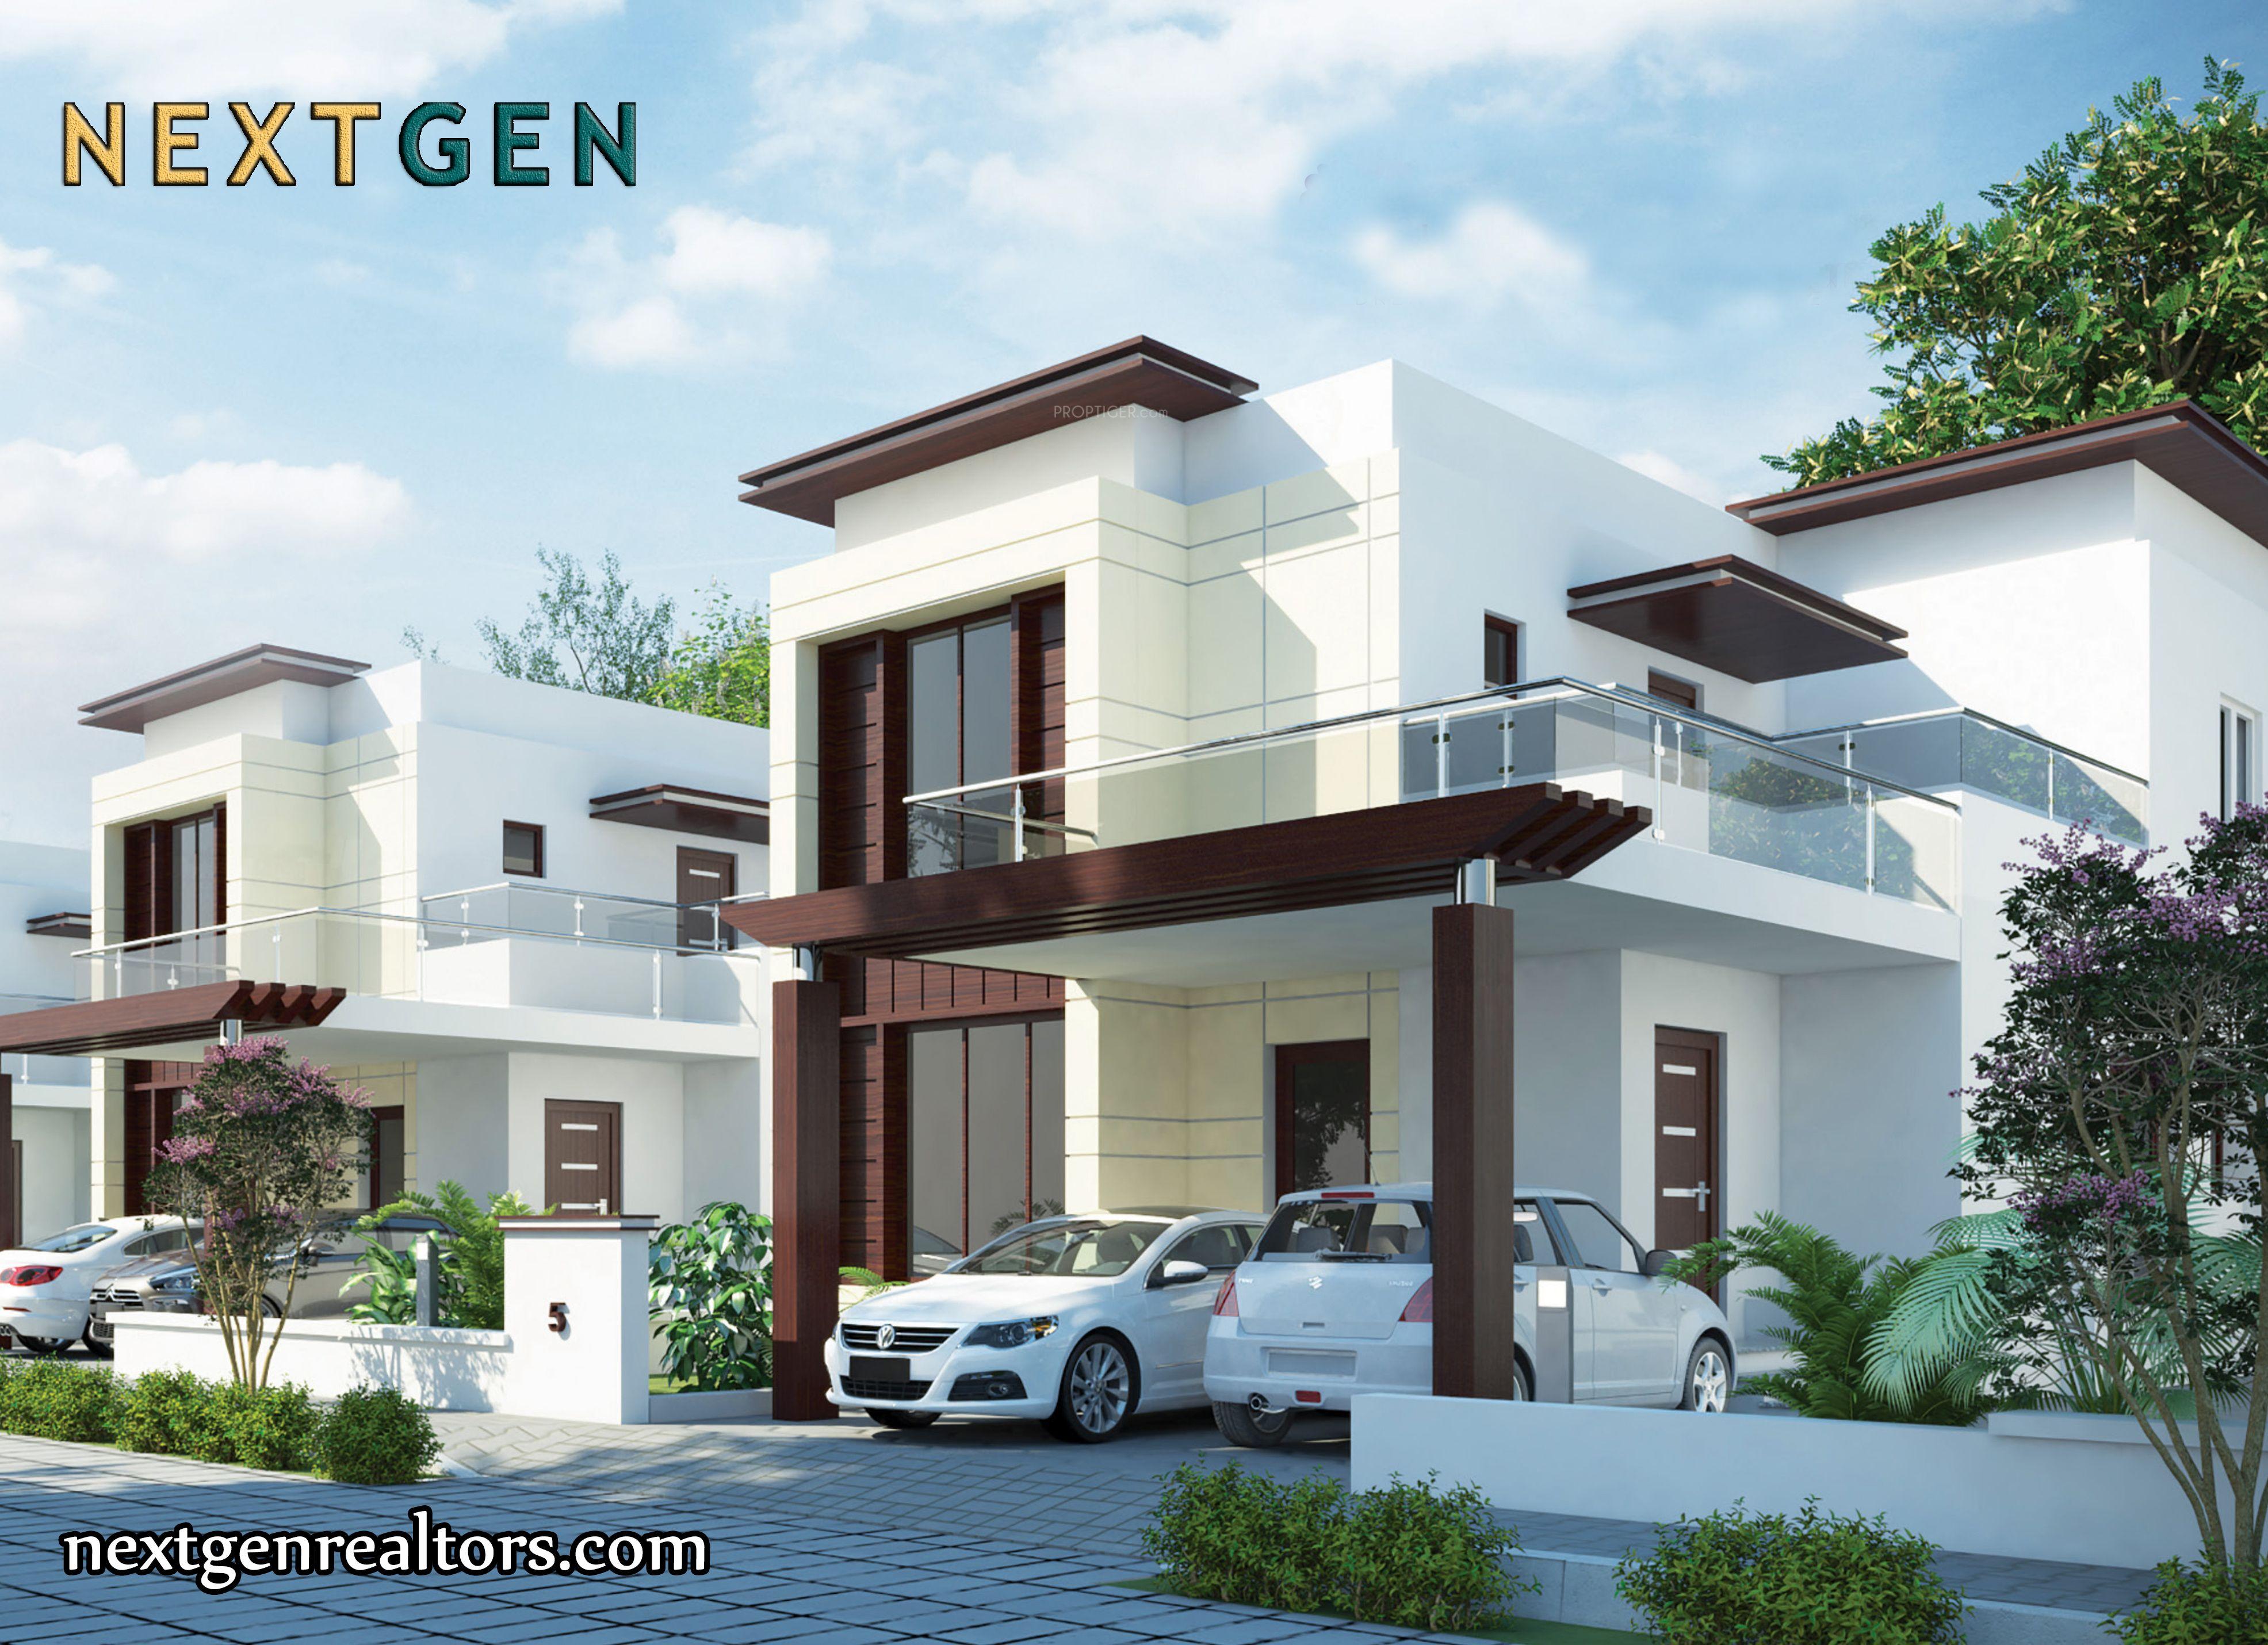 850647bc7a29e4292cb01e0158737764 - Villa For Sale In Nectar Gardens Madhapur